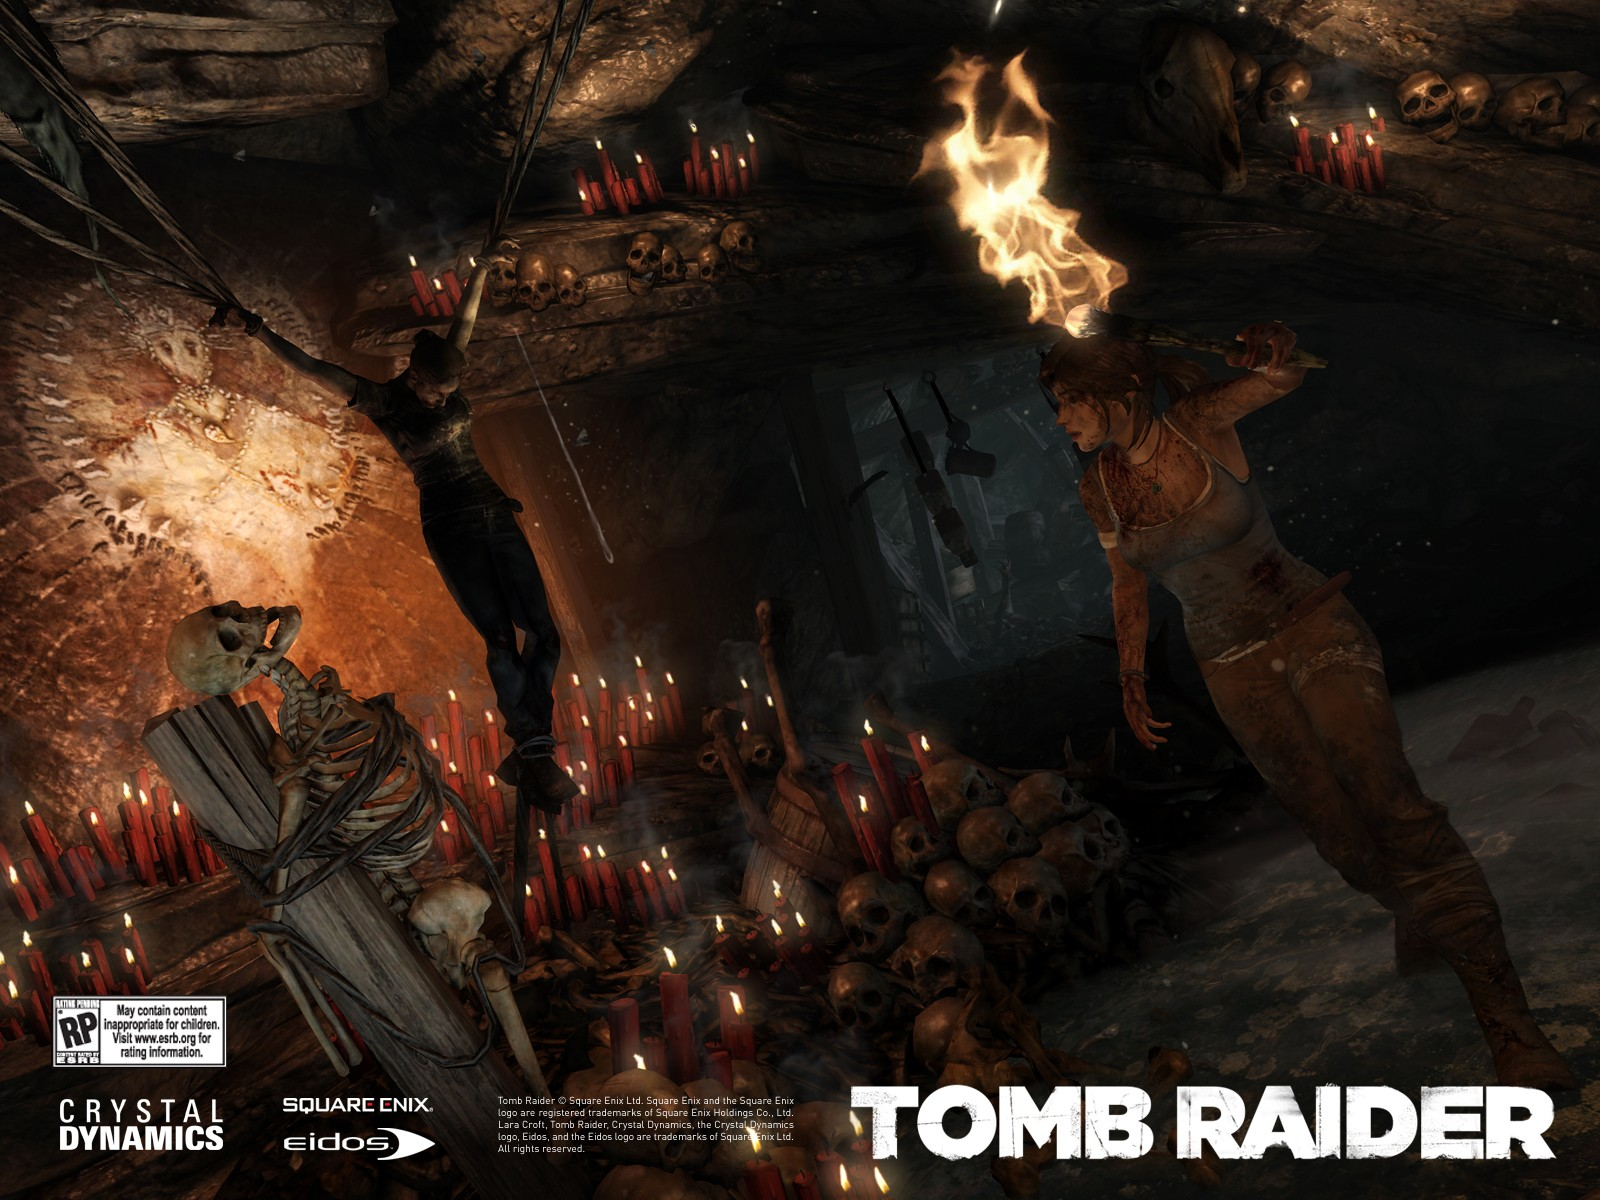 http://2.bp.blogspot.com/-hVDuyyKWLt4/Toe_pQ4J8QI/AAAAAAAADjs/ySaO3TYwtII/s1600/Tomb_Raider_wallpapers+%252812%2529.jpg